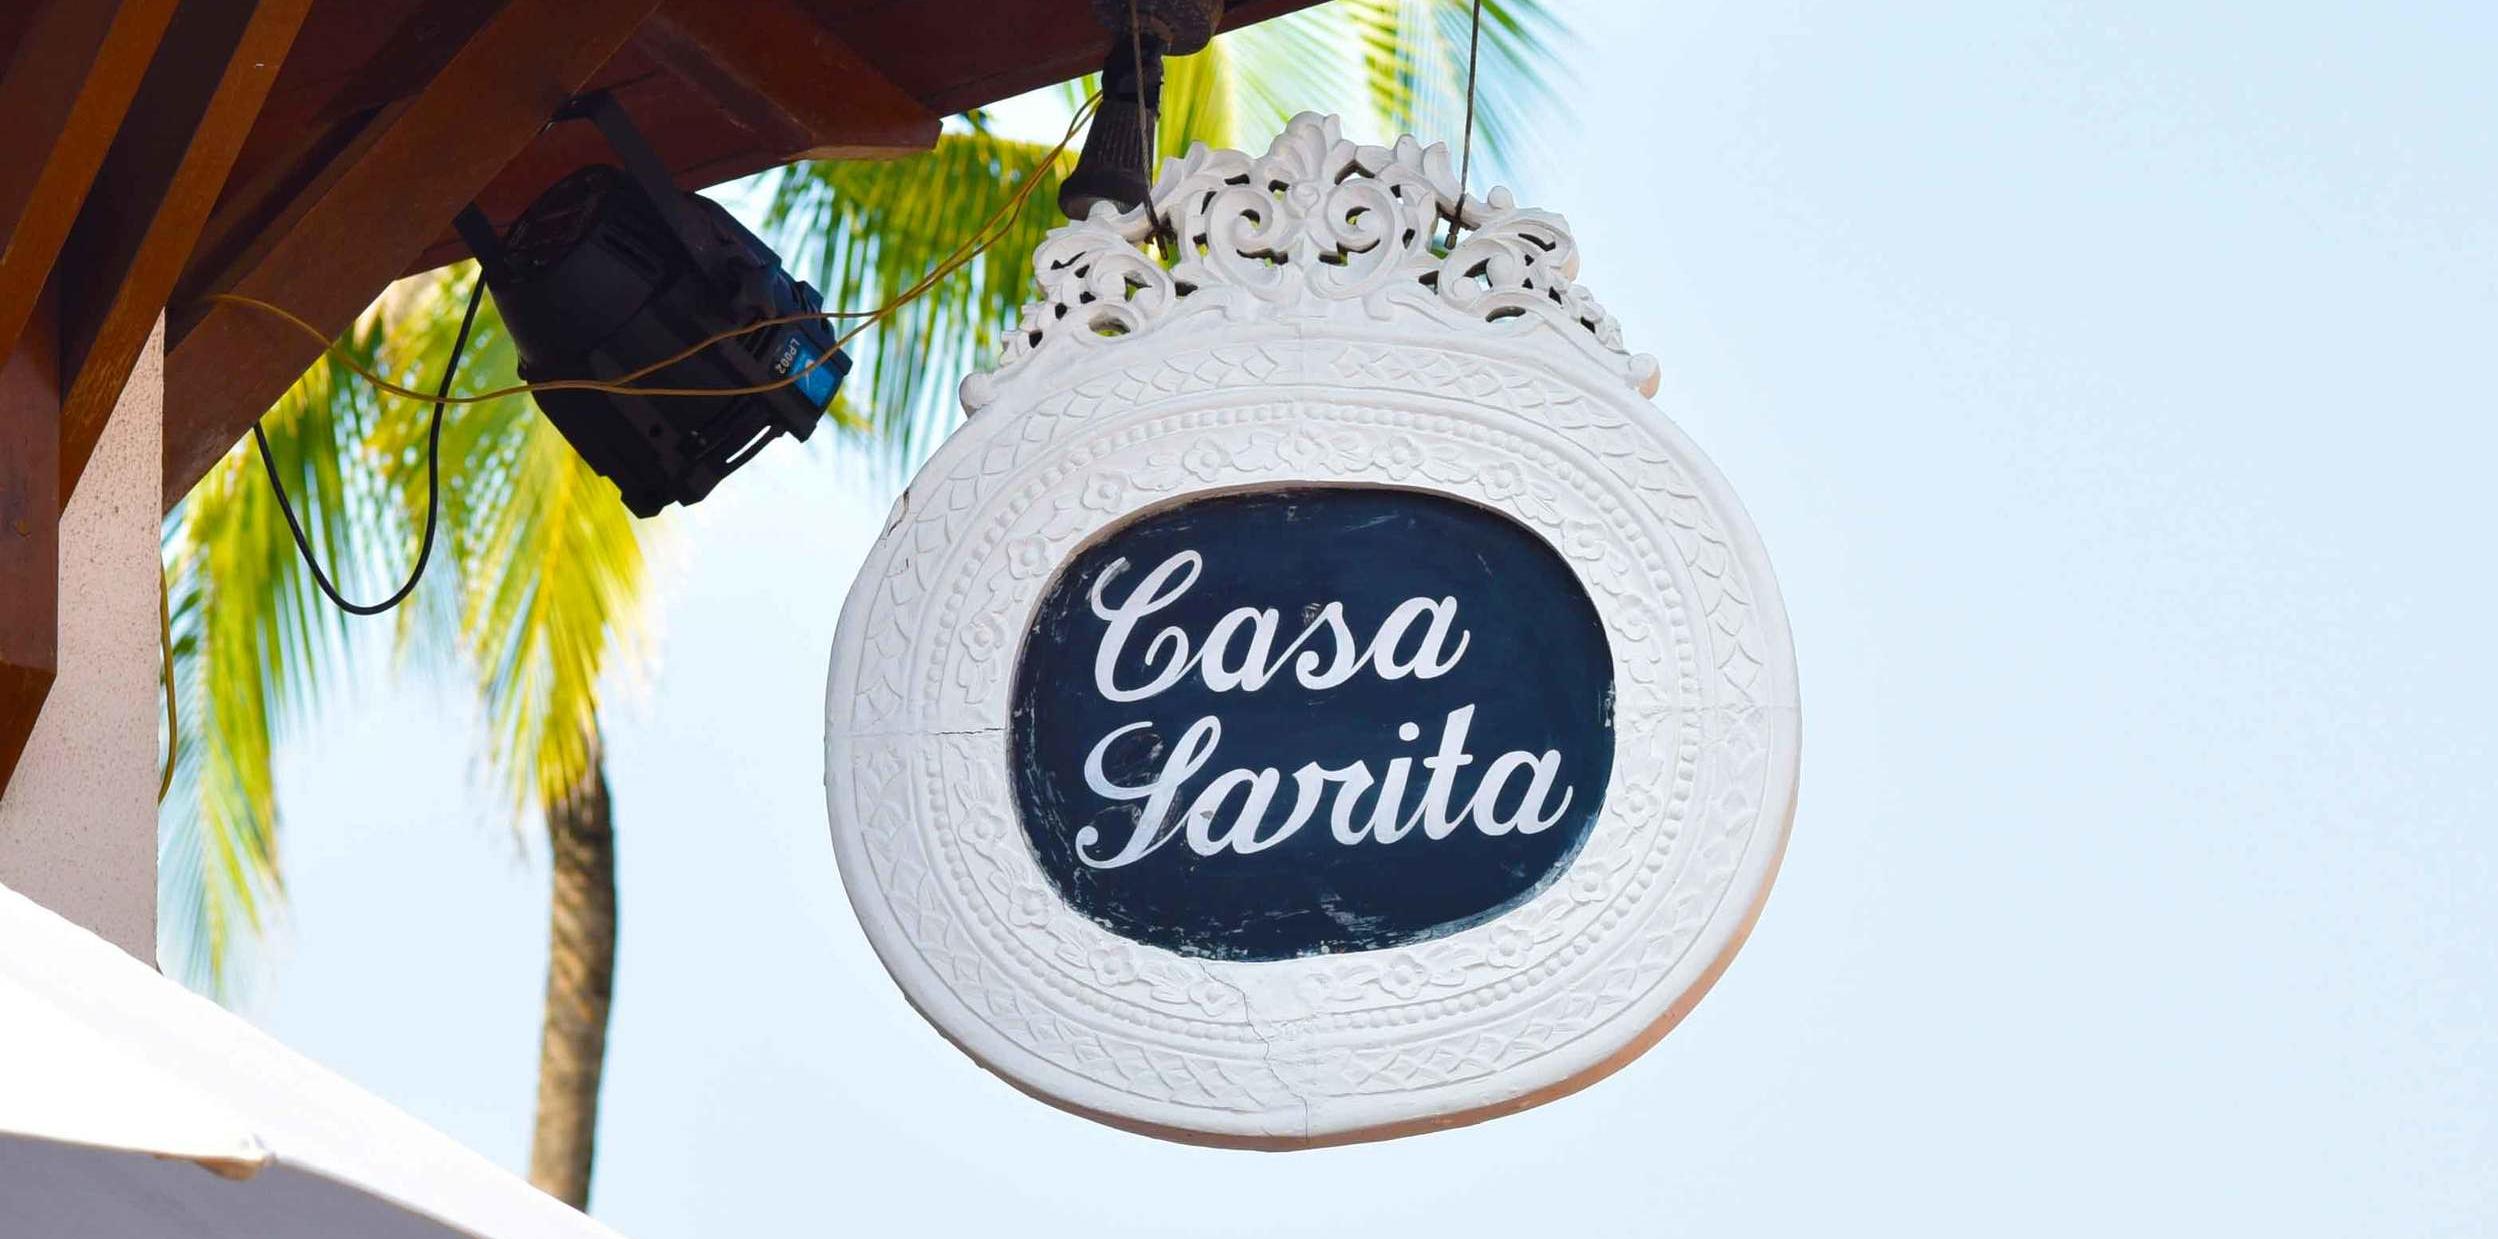 Goan cuisine, restaurant,Casa Sarita, Park Hyatt, beach resort, Goa, India. Image©thingstodot.com